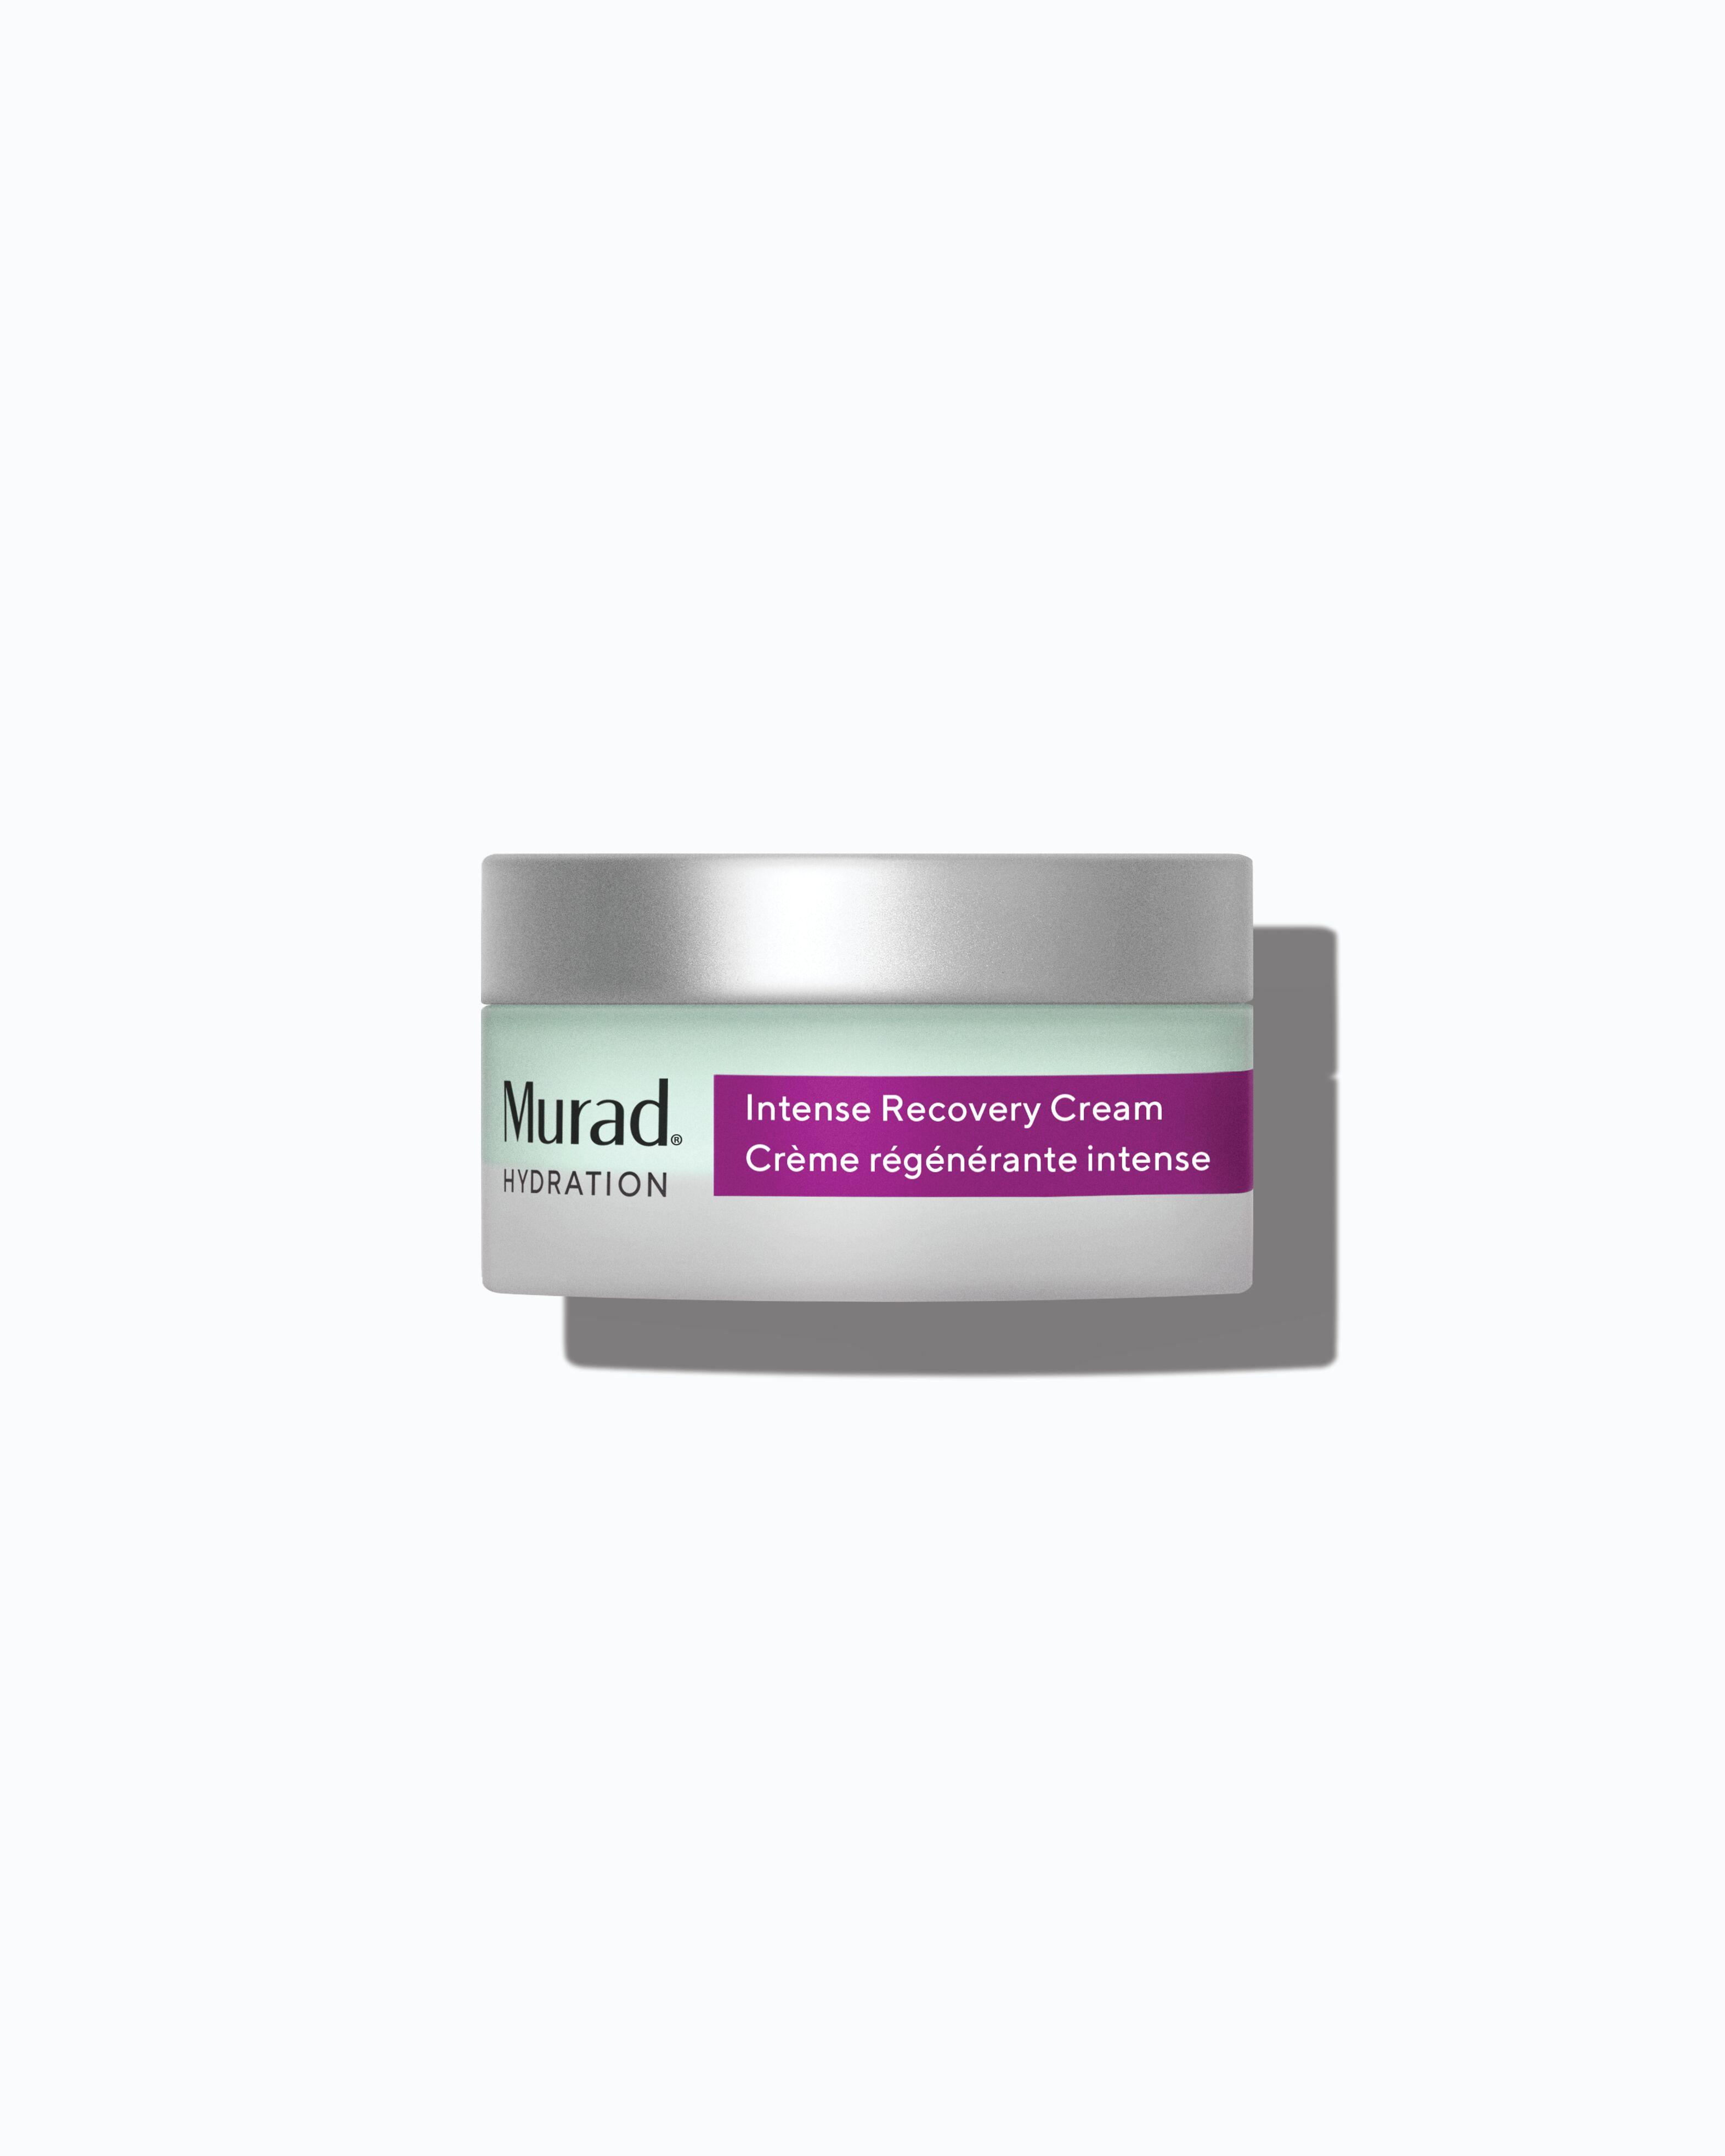 Murad Hydration Intense Recovery Cream, 50 ml